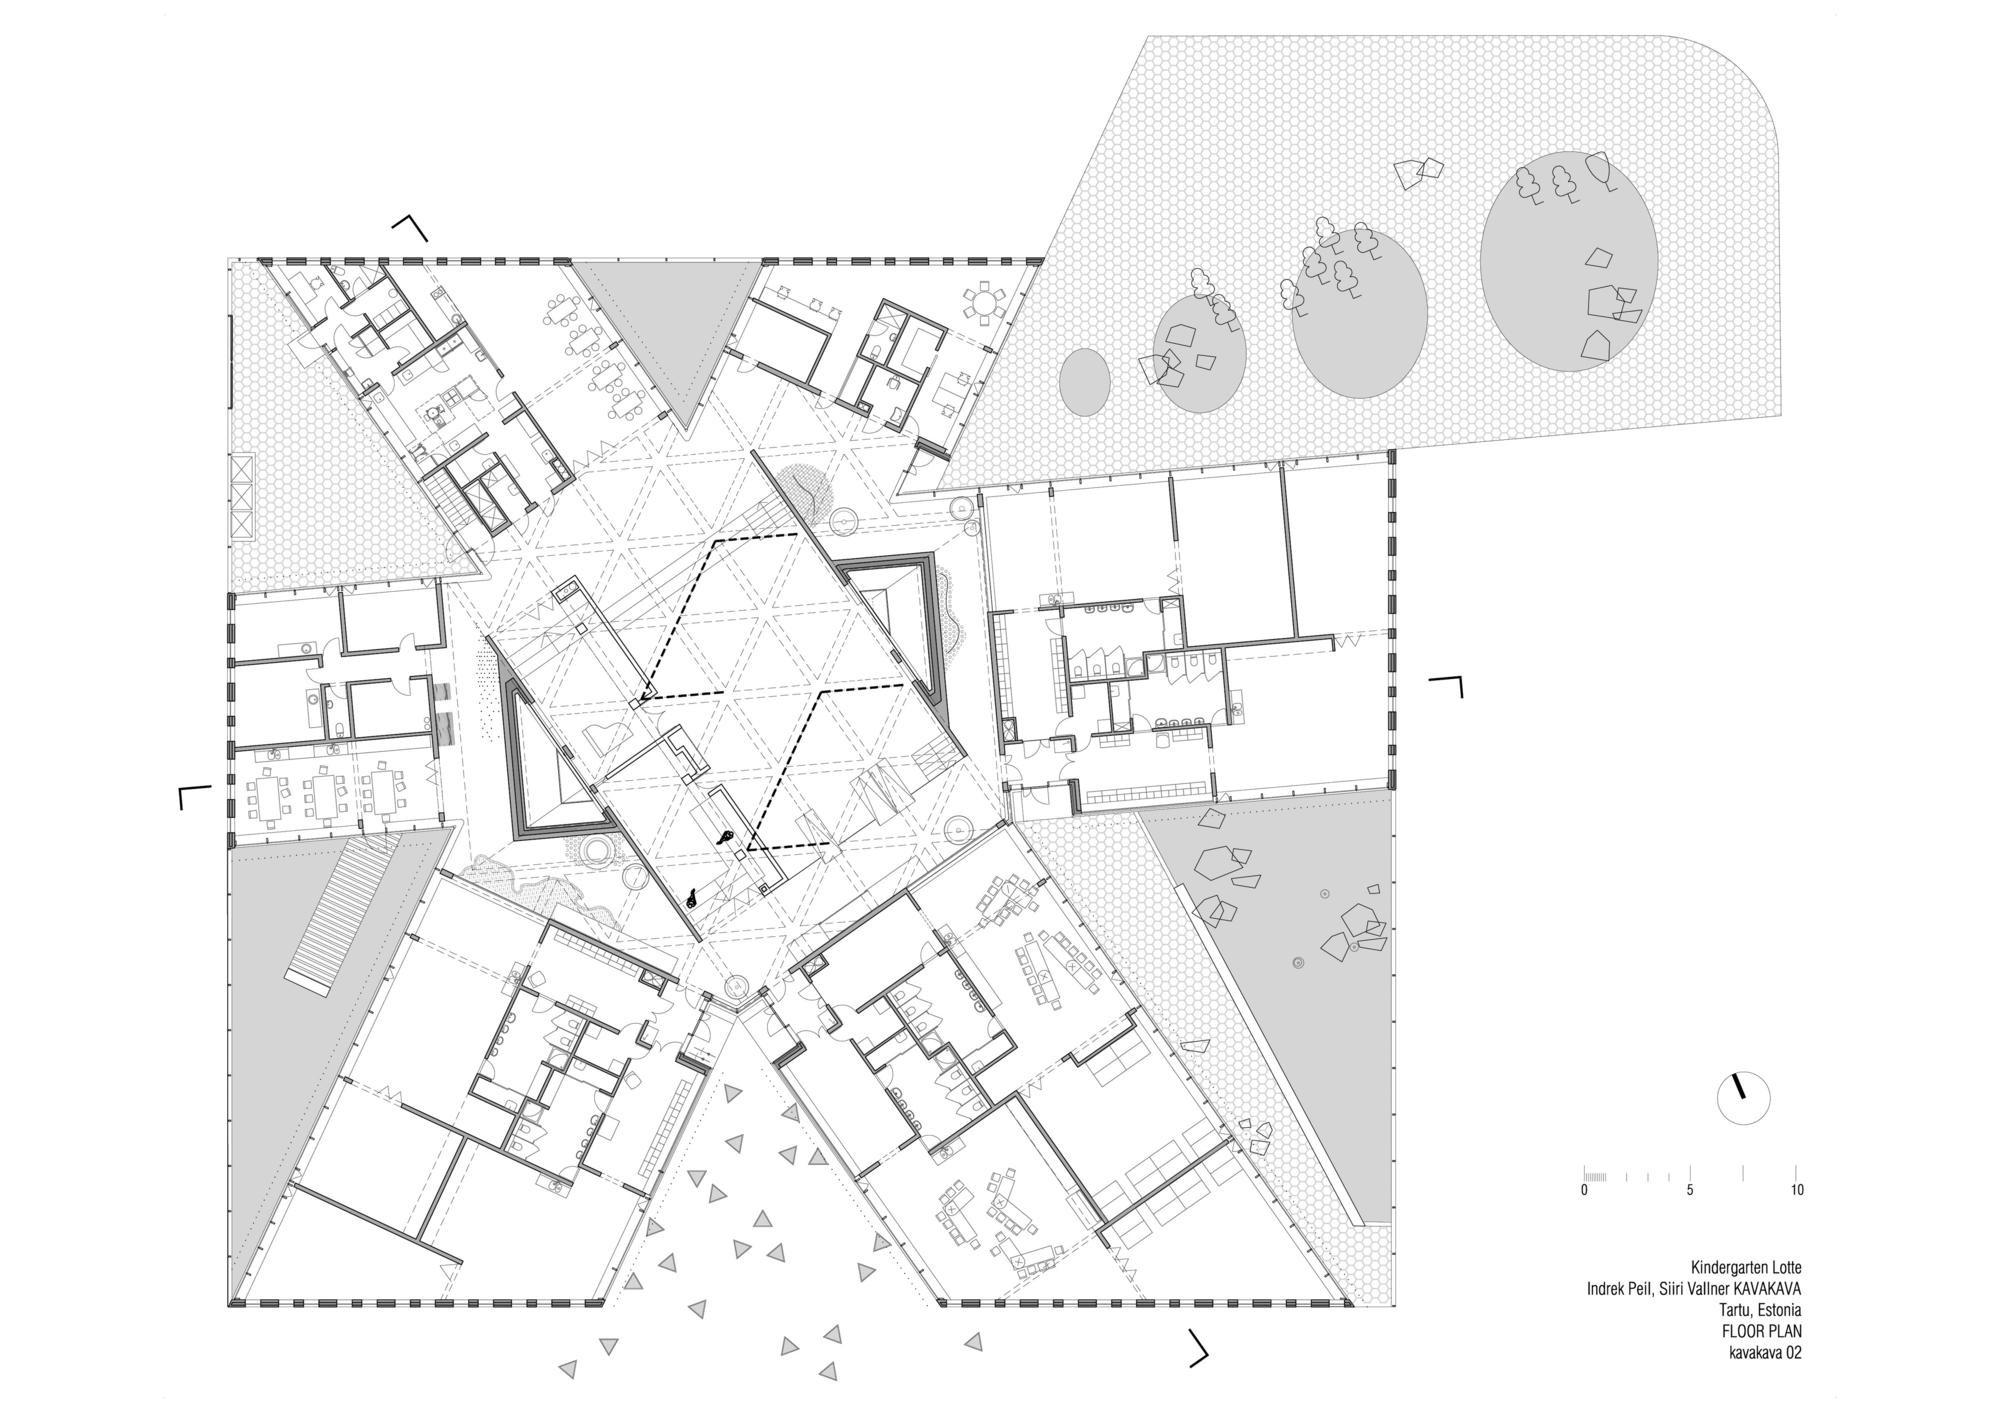 514fb202b3fc4b8528000075 Kindergarten Lotte Kavakava Architects Drawing Plan Png 2000 1413 How To Plan Architect Drawing Kindergarten